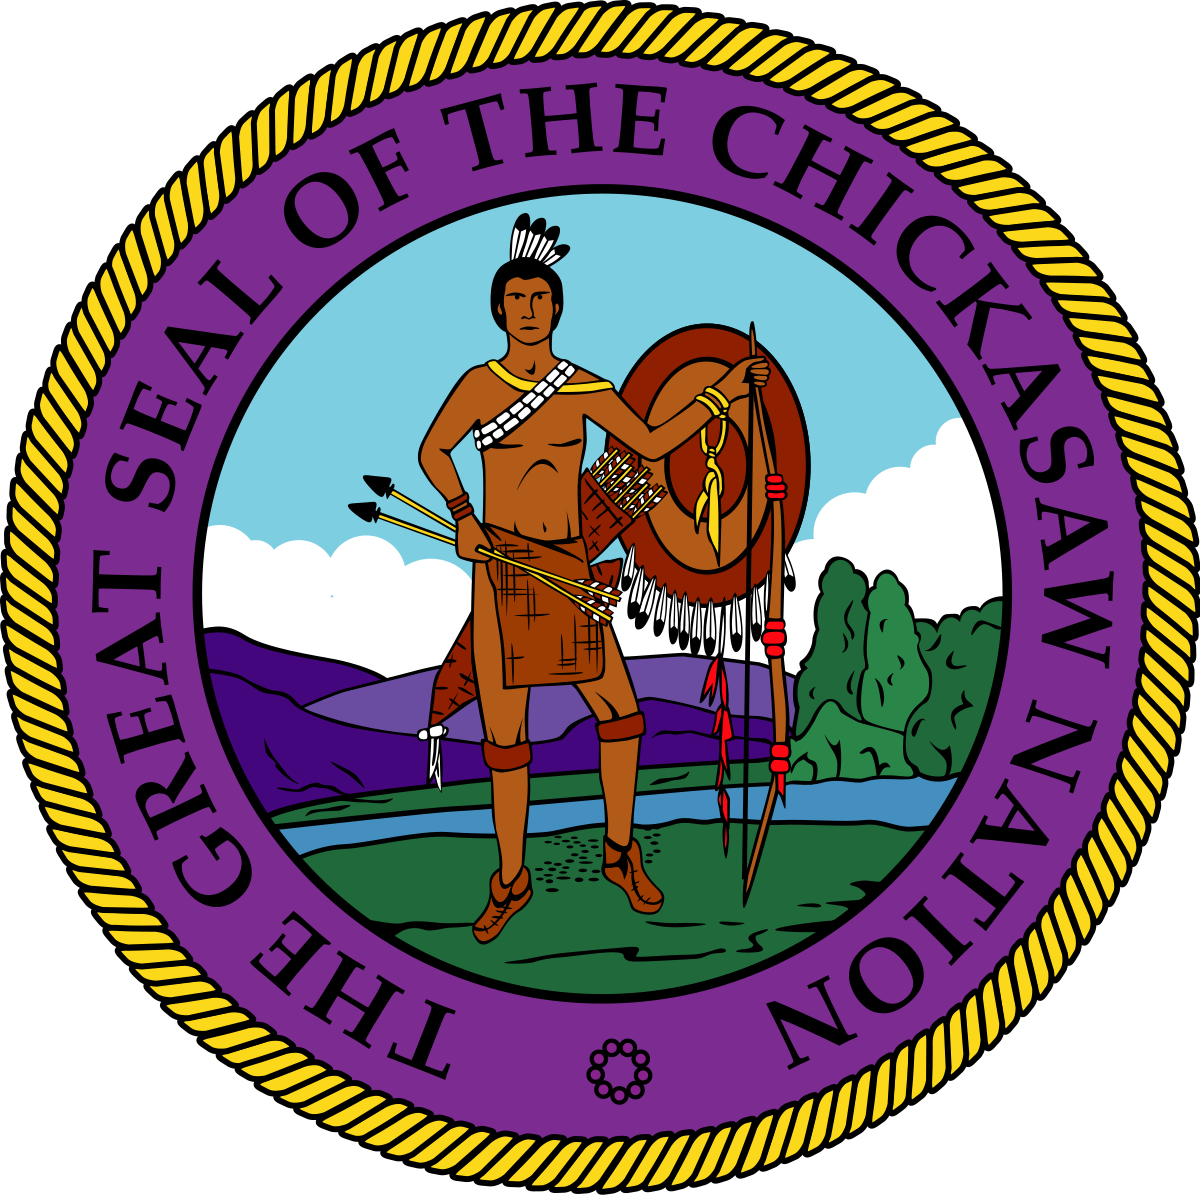 Florida clipart seminole tribe. Chickasaw nation wikipedia